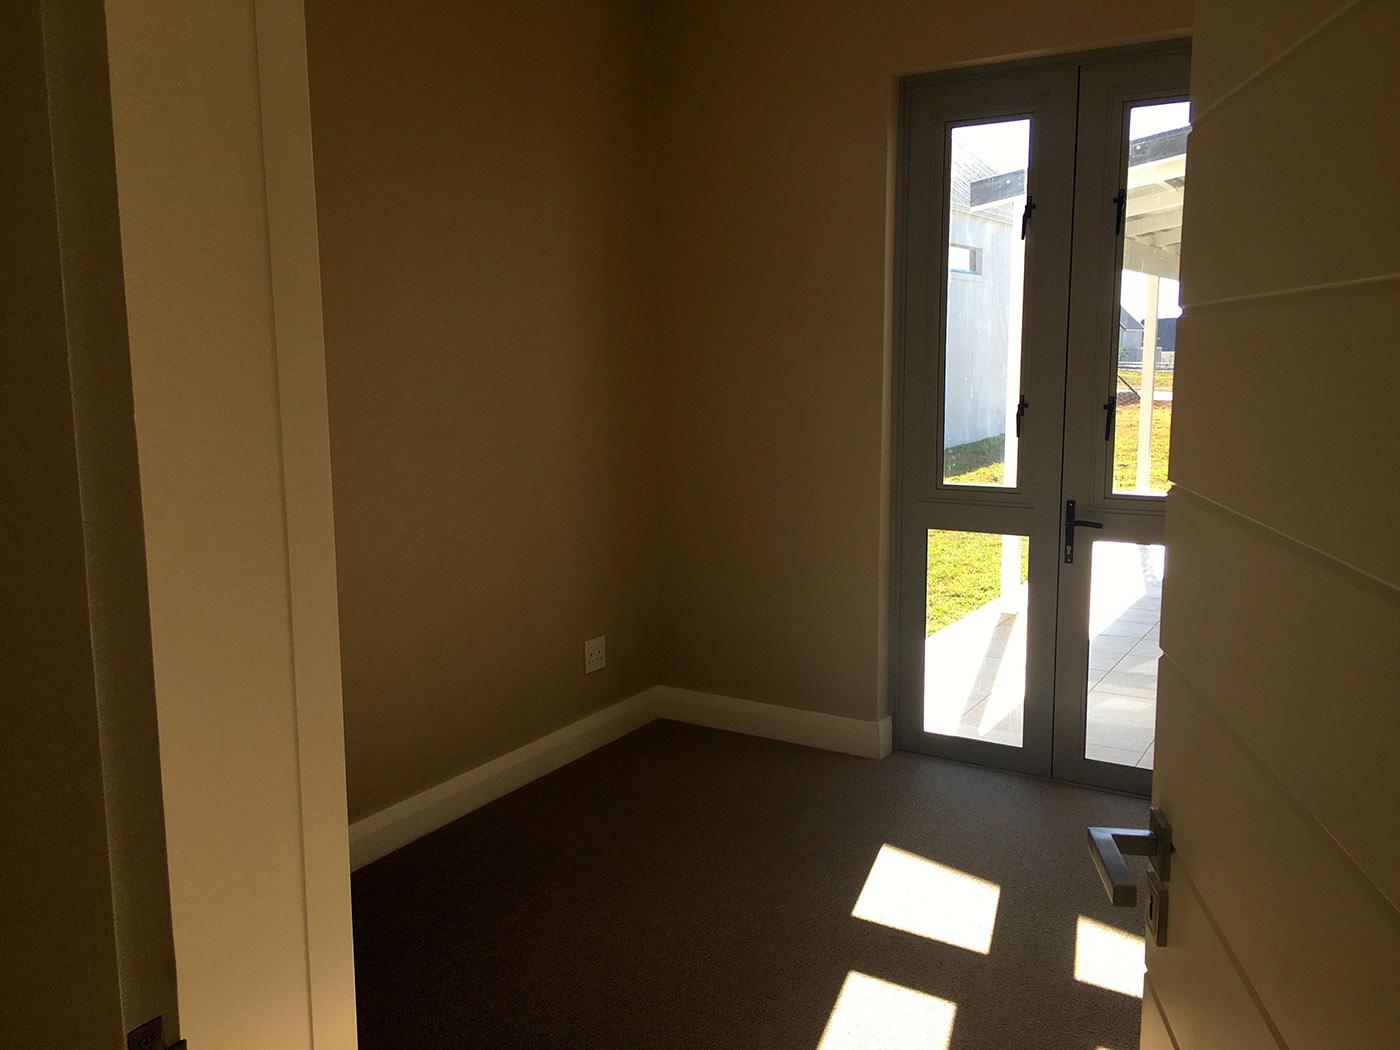 brand-new-house-for-sale-in-the-lifestyle-village-garlington-estate-kzn